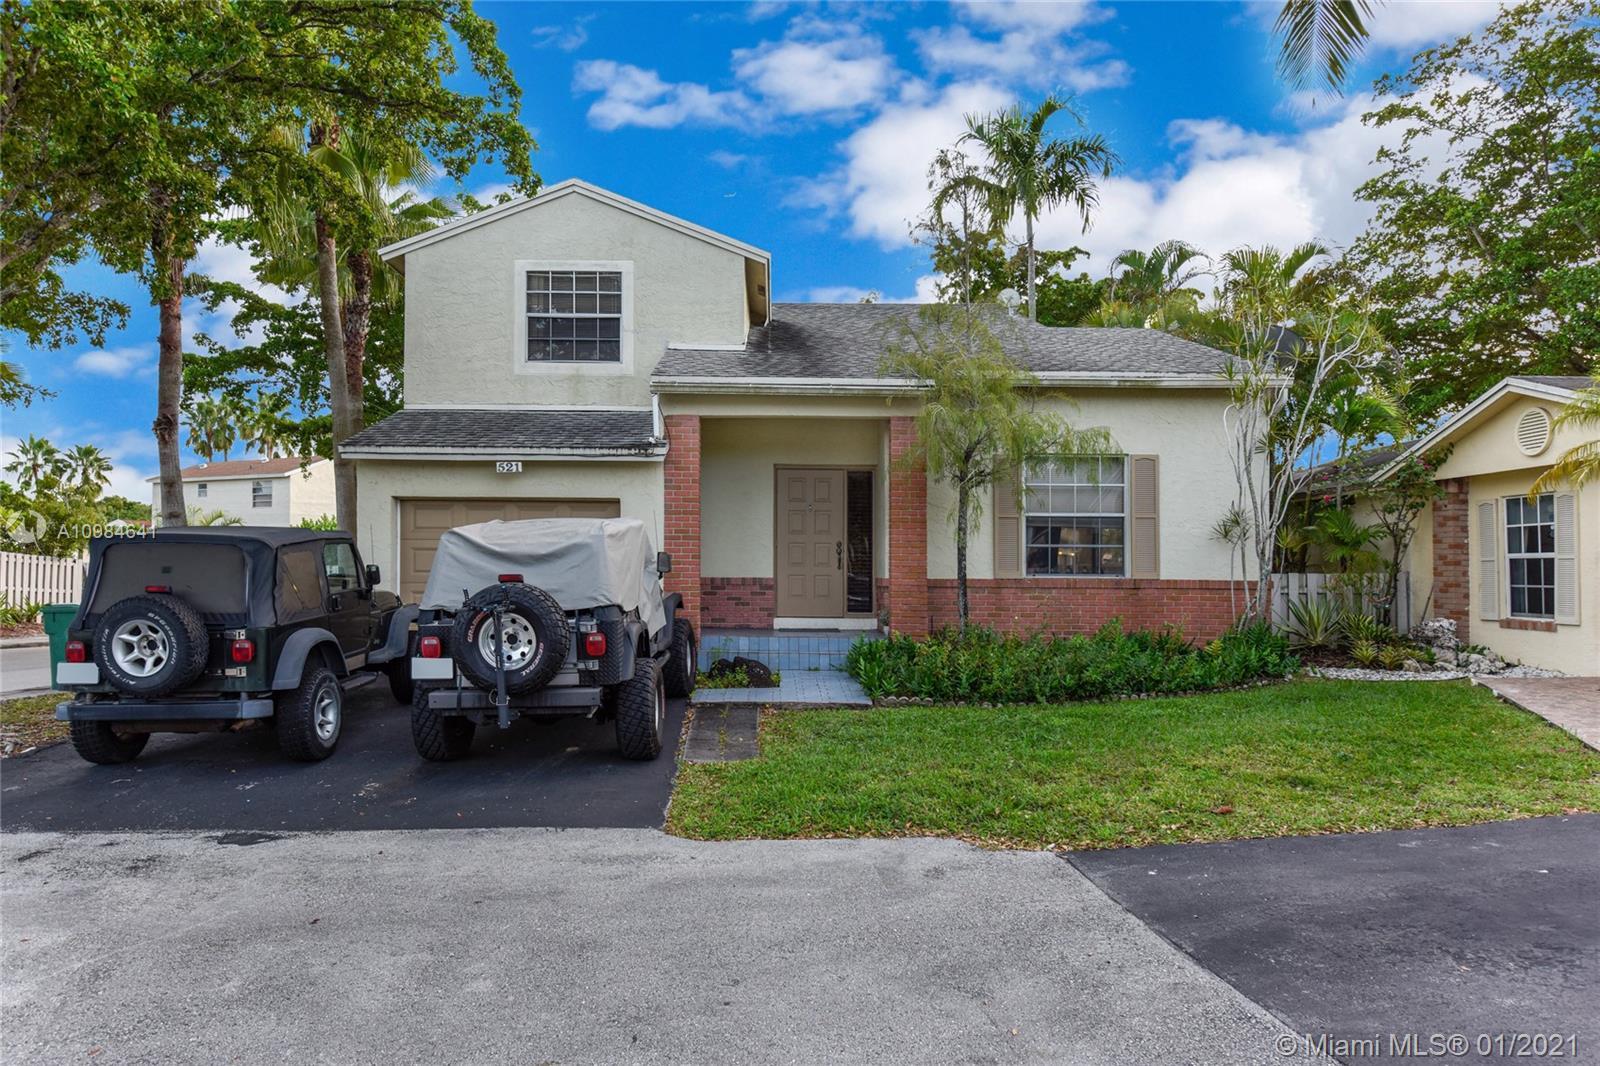 521 Danville Ter, Davie, Florida 33325, 3 Bedrooms Bedrooms, ,3 BathroomsBathrooms,Residential,For Sale,521 Danville Ter,A10984641